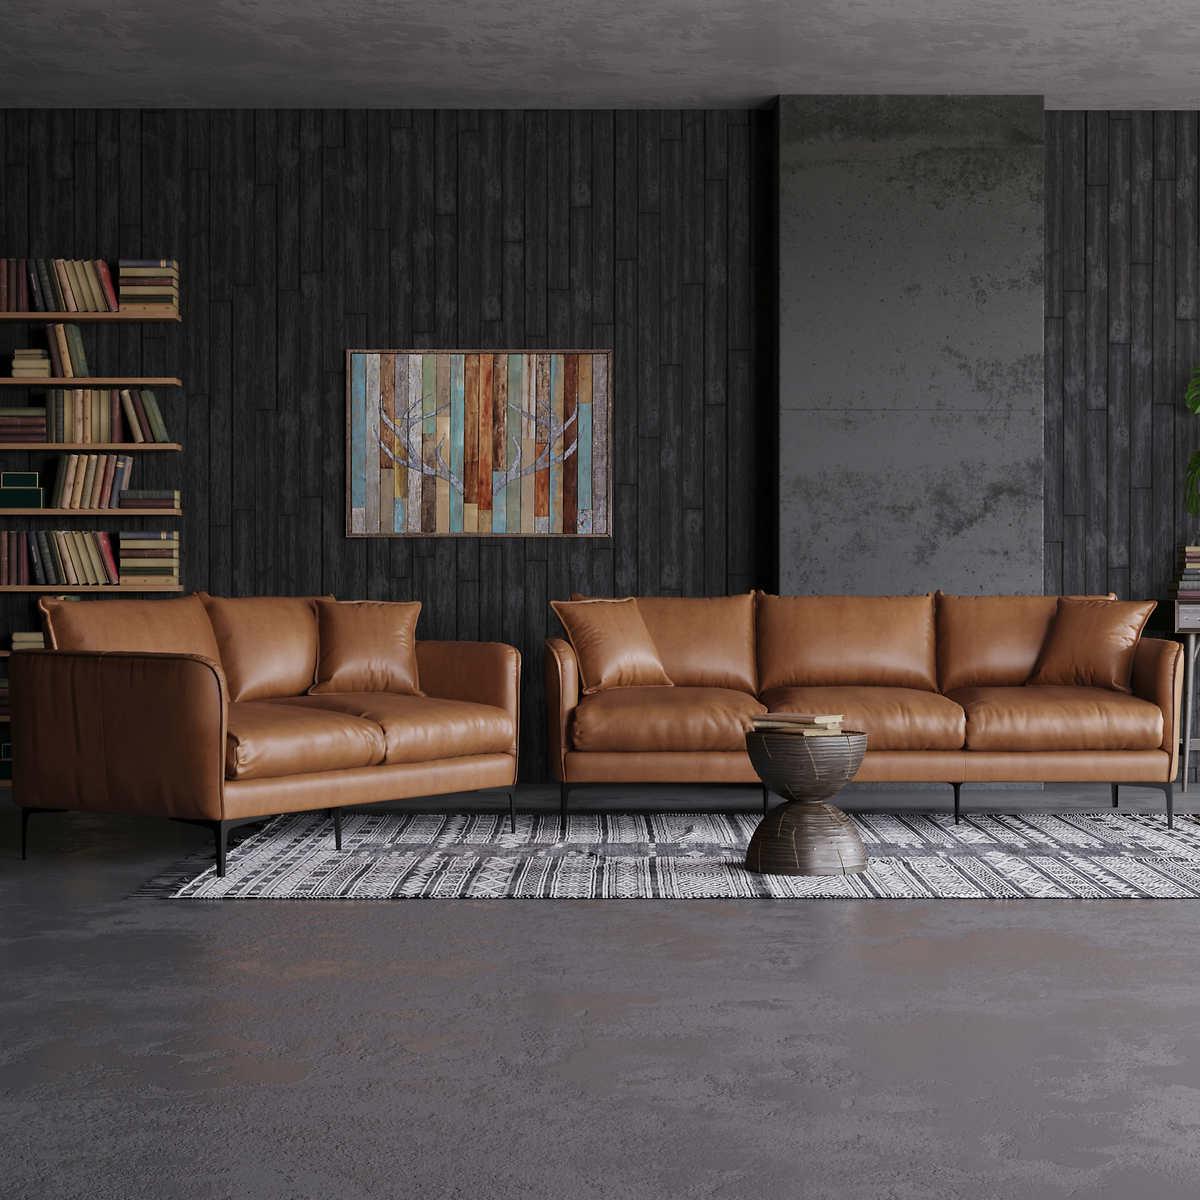 Misha Tan Top Grain Leather Sofa and Loveseat